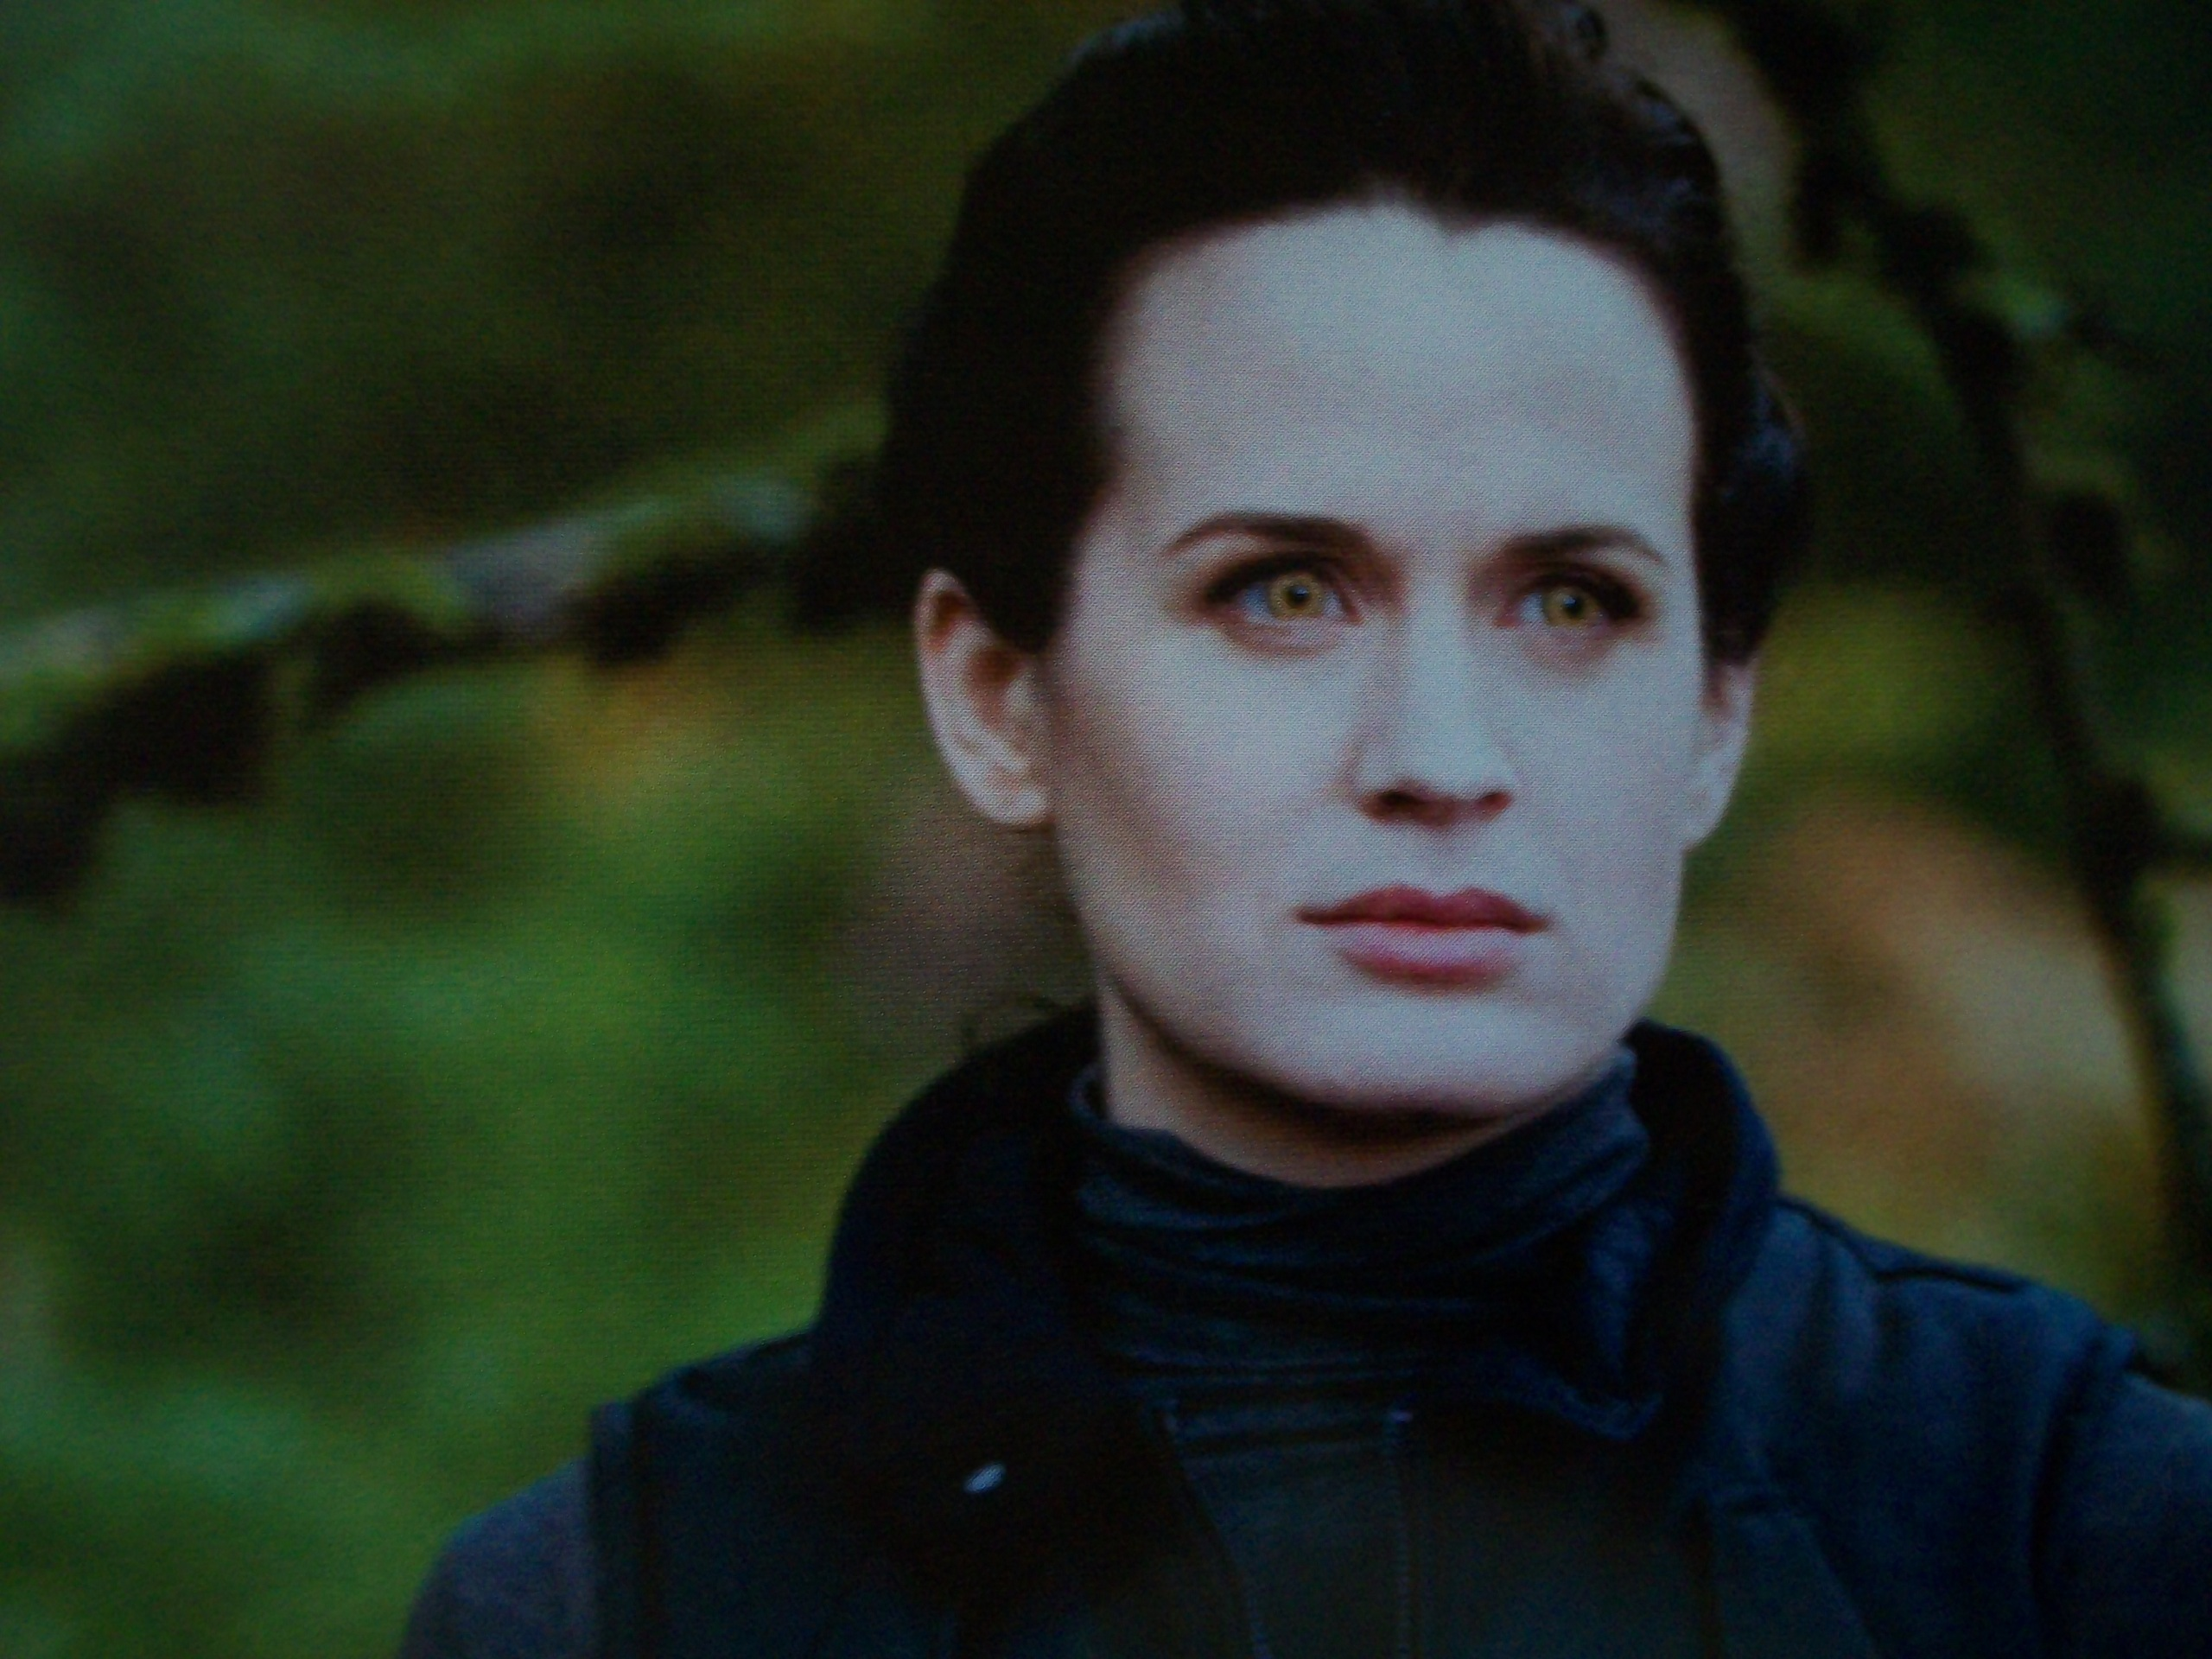 Breaking Dawn Wallpaper Hd Esme Cullen Images Esme Eclipse Movie Companion Hd